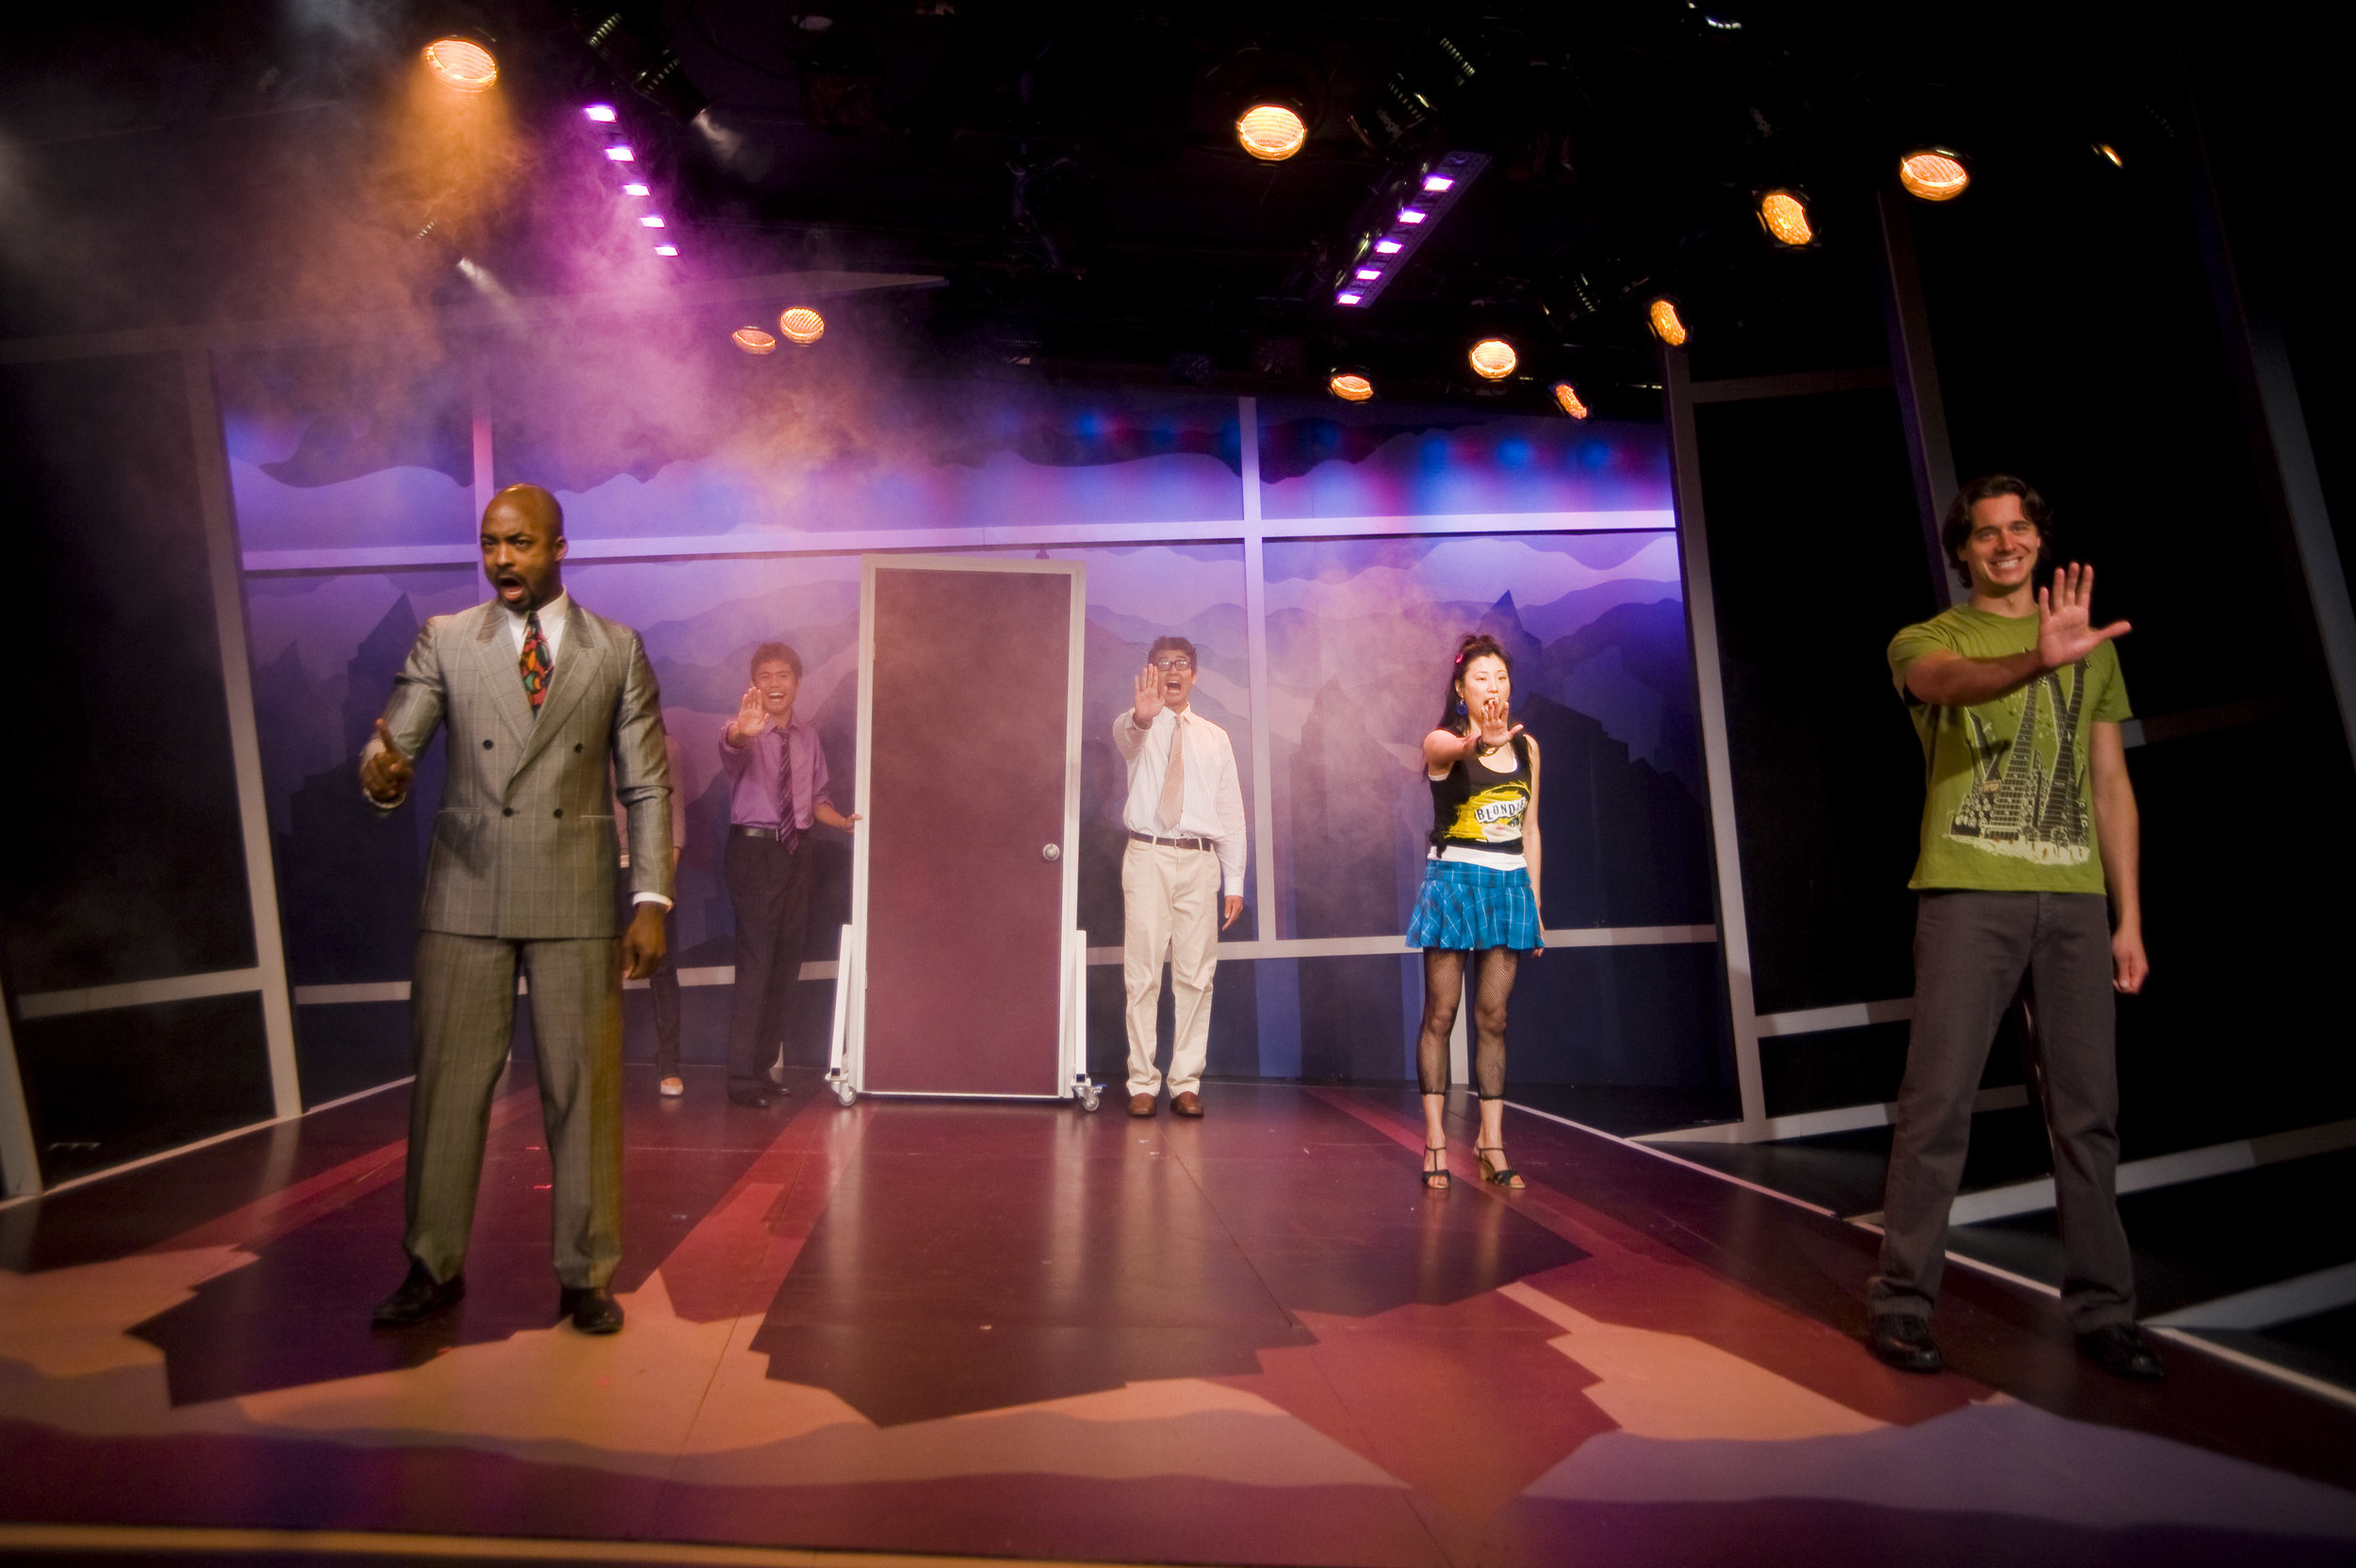 2008 Barrington Stage Company workshop-production, dir. Andrew Volkoff. Starring Terence Archie, Heath Calvert, Nathaniel P. Claridad, Deborah S. Craig, Greta Lee, and JP Moraga.